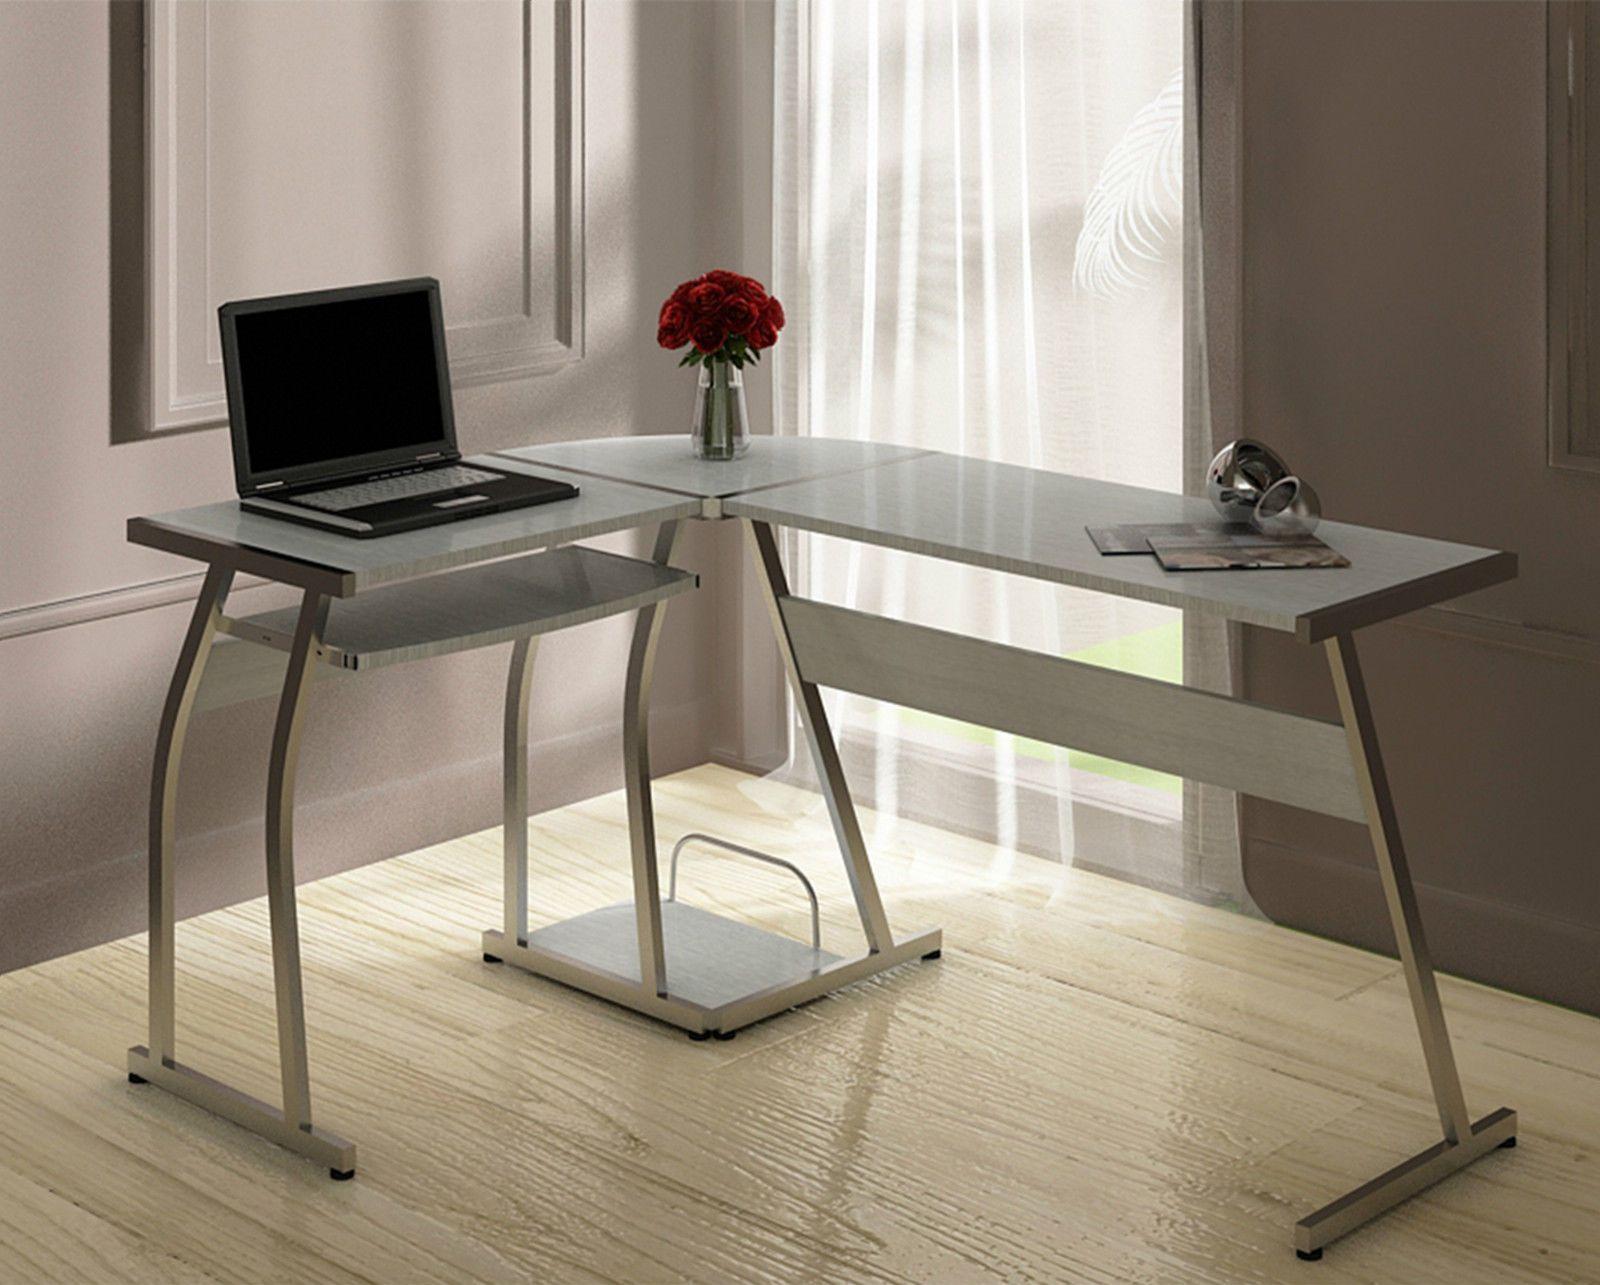 contemporary home office desks uk. L Shaped Corner Computer Desk Shape Home Office Furniture Contemporary Desks Uk